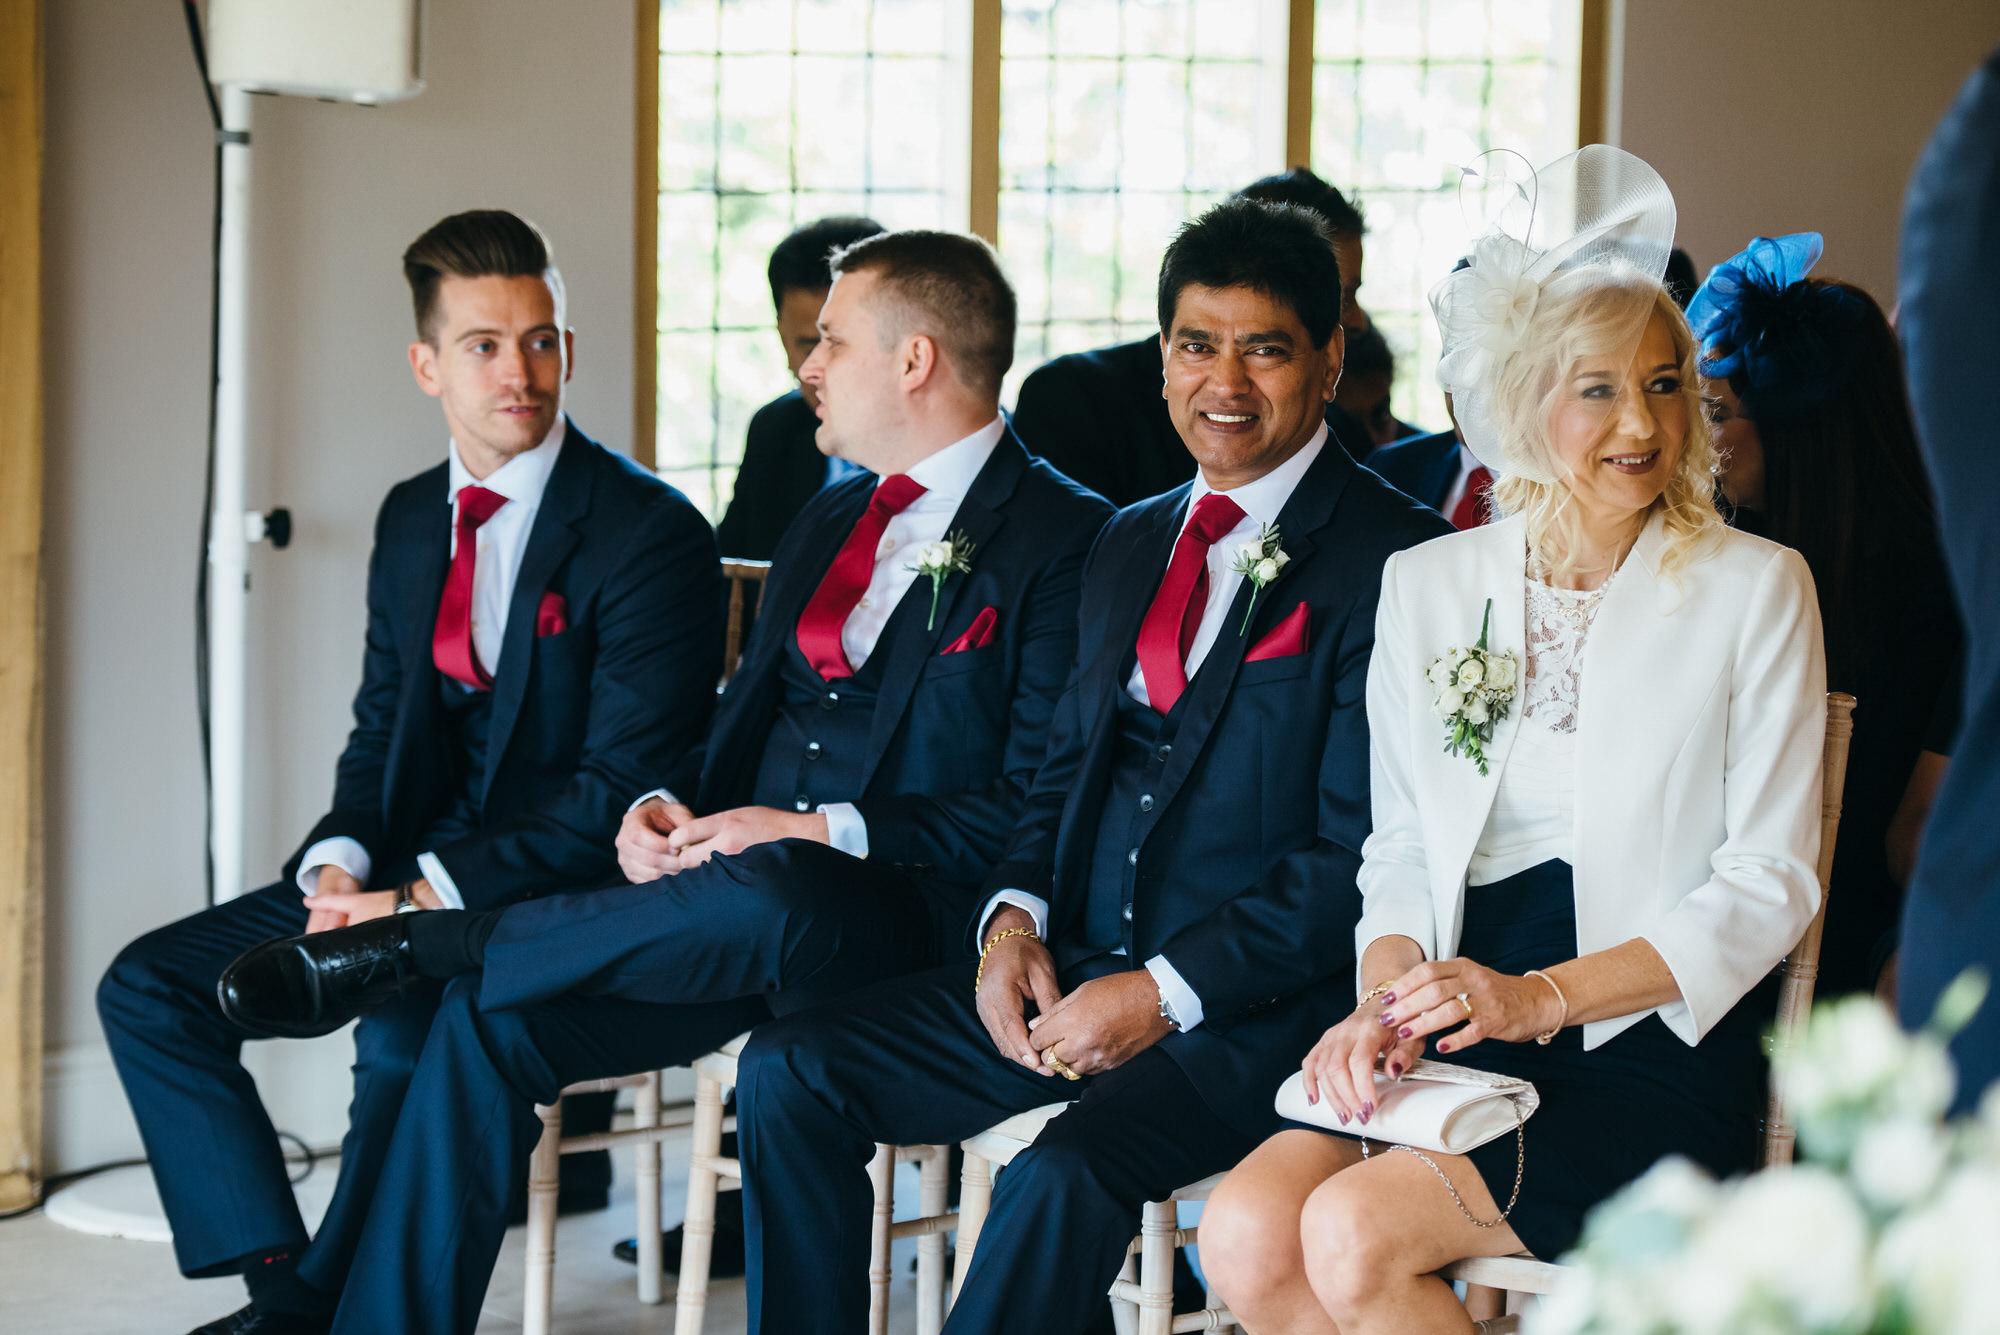 Merrydale manor wedding photography 040